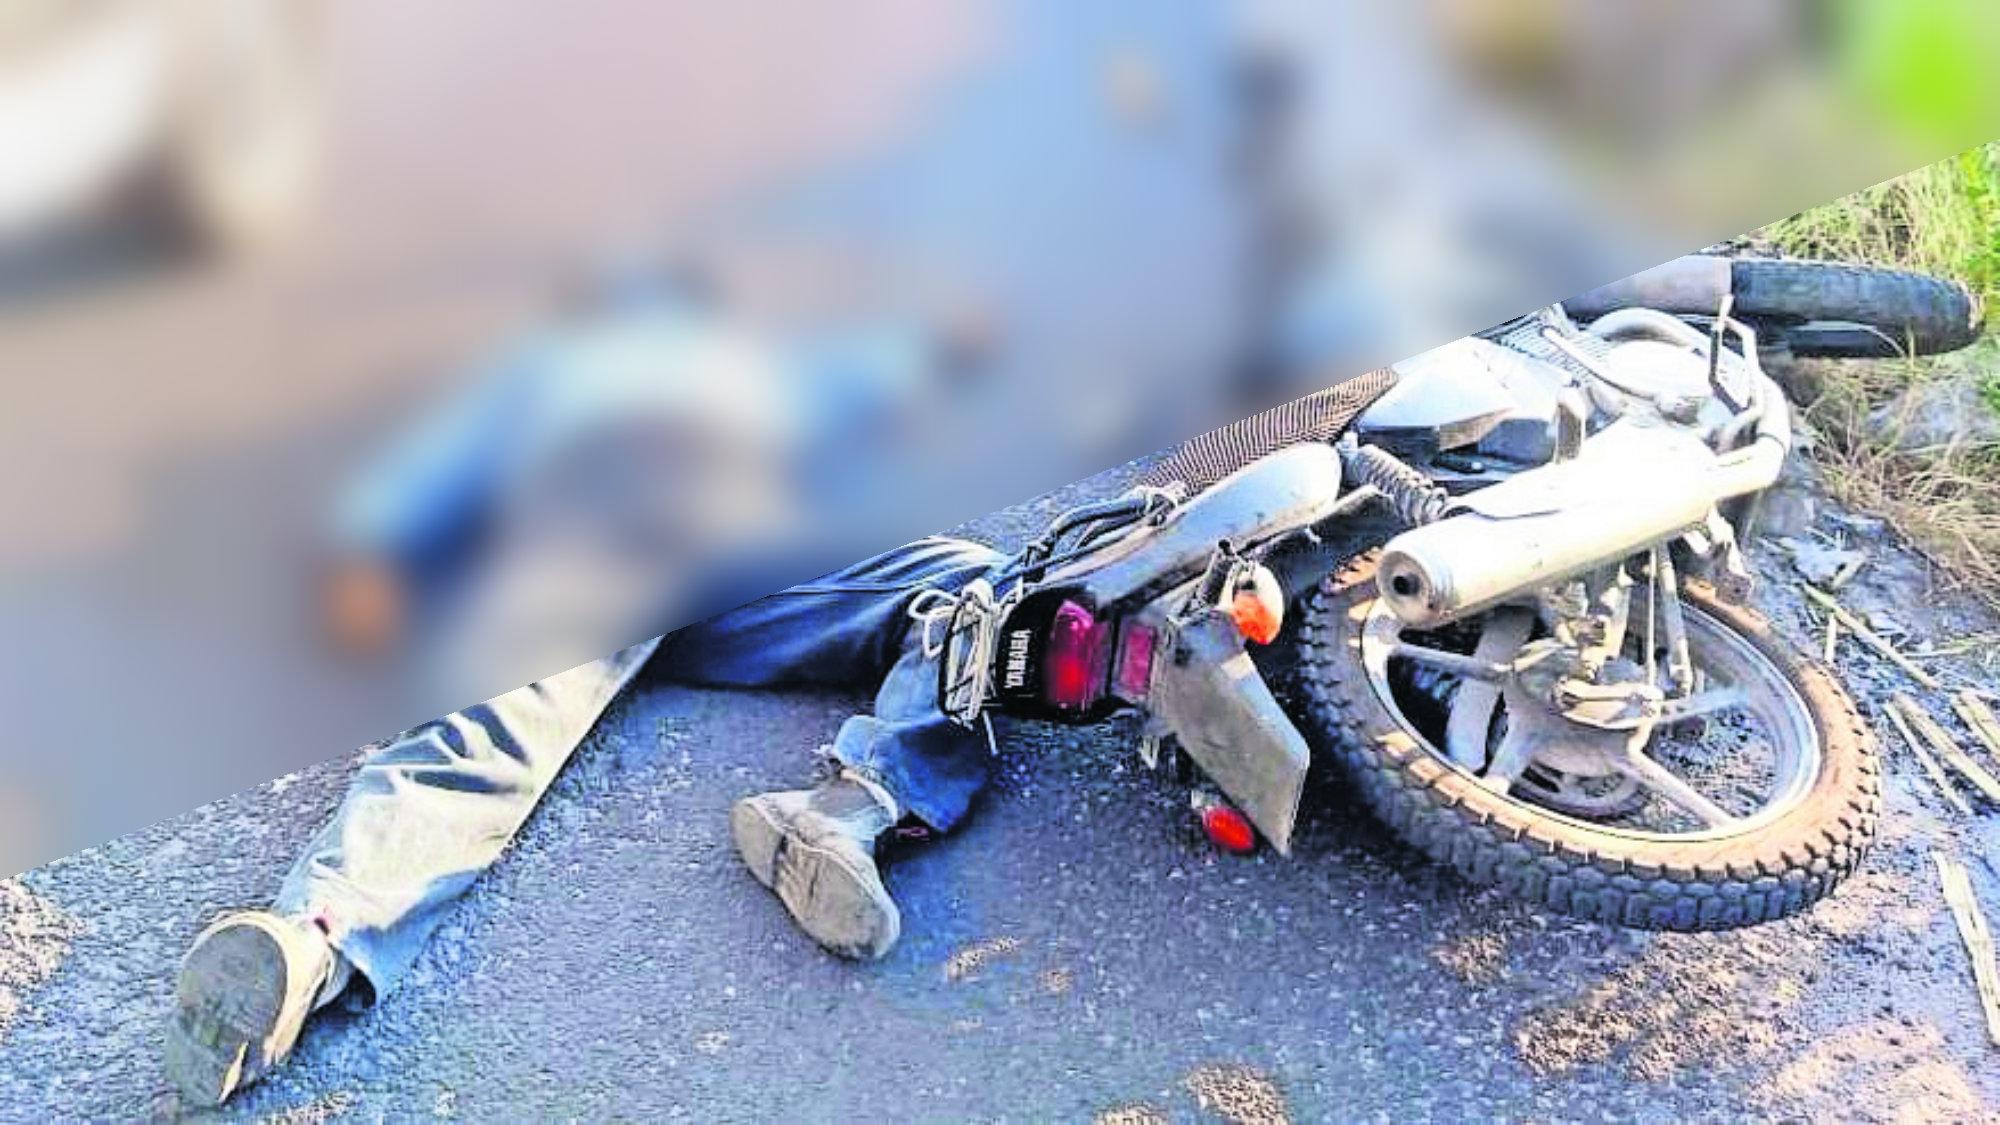 Ejecutan a motociclista Escopeta Morelos